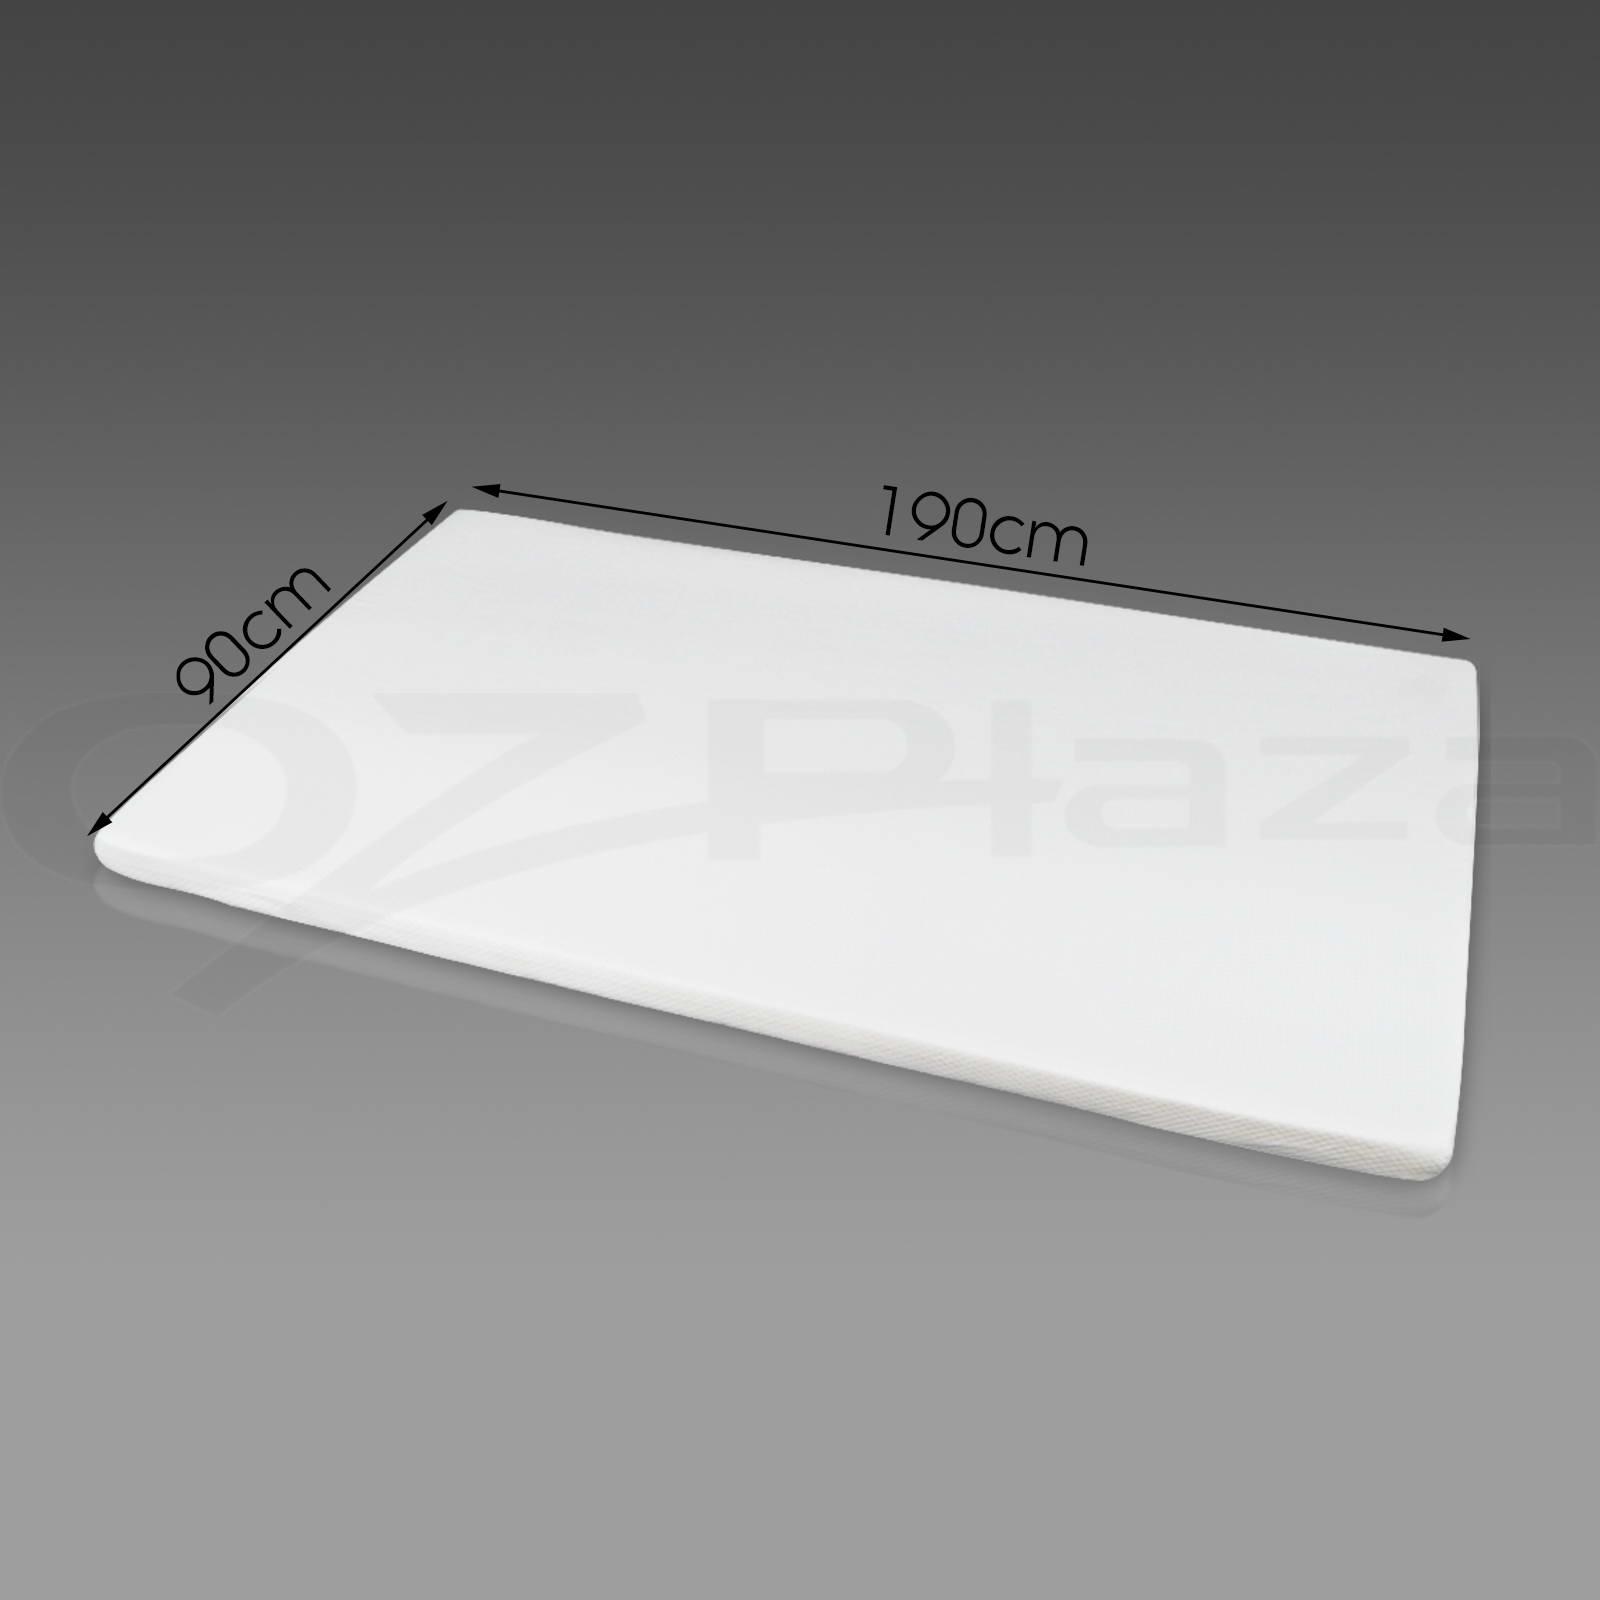 5CM Memory Foam Mattress Topper BAMBOO Fabric Underlay Cover